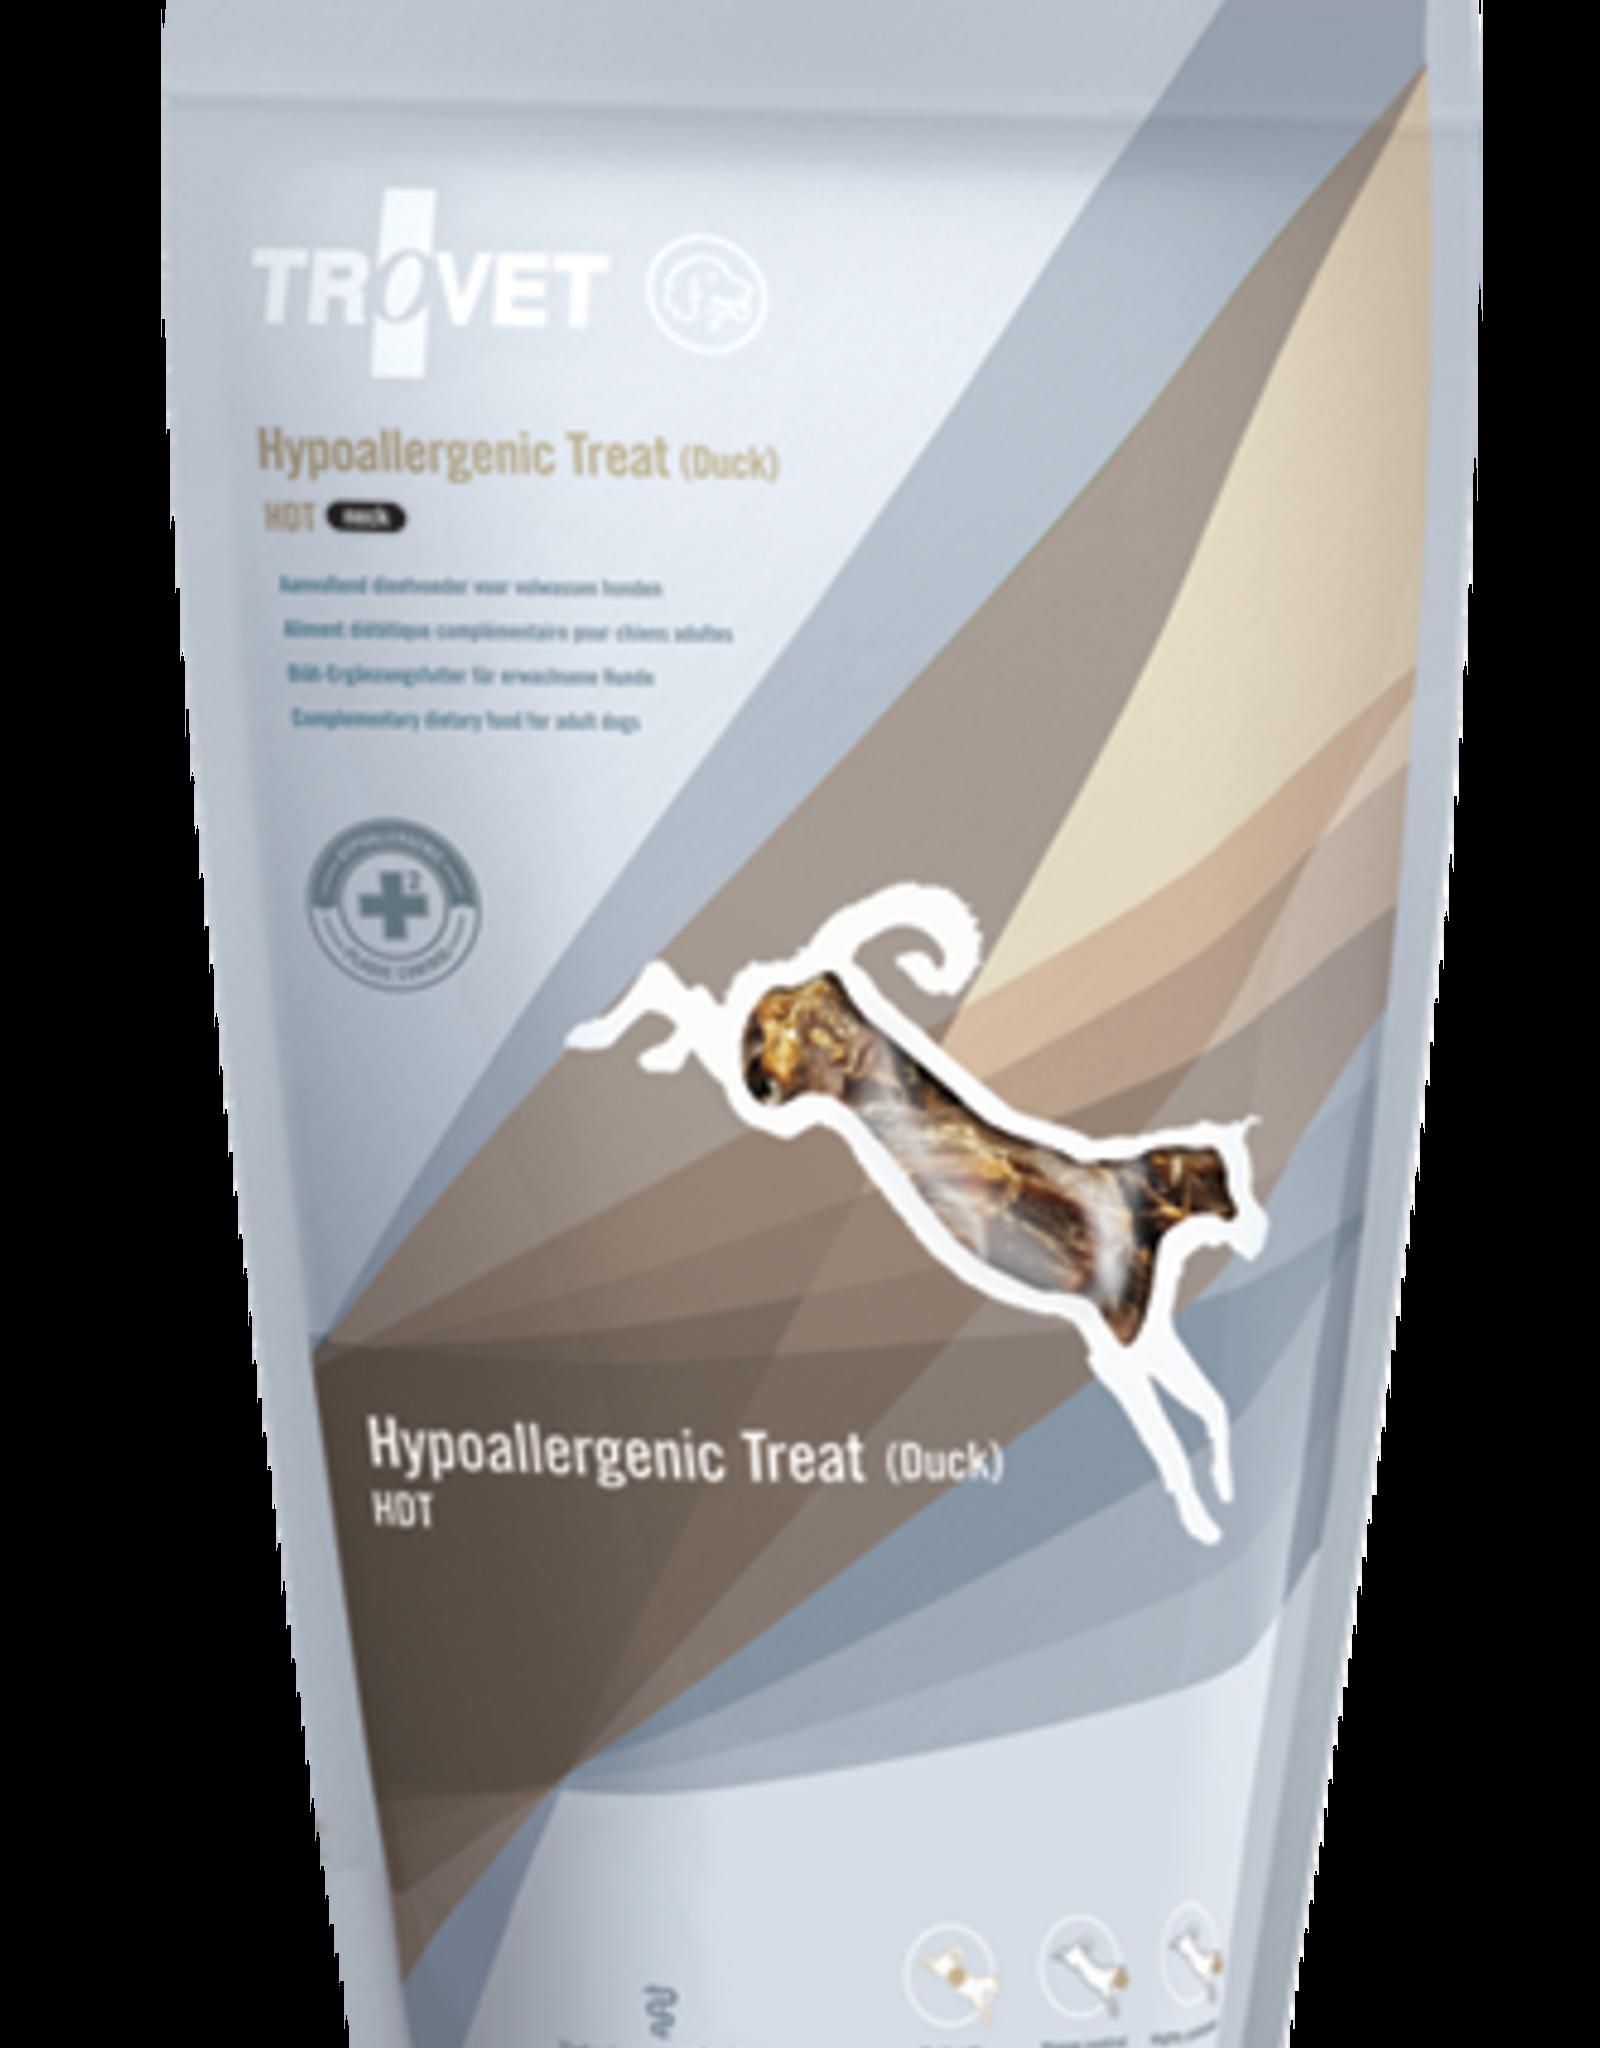 Trovet Trovet Canine Hdt Hypoallergenic Treat Duck Neck 200g